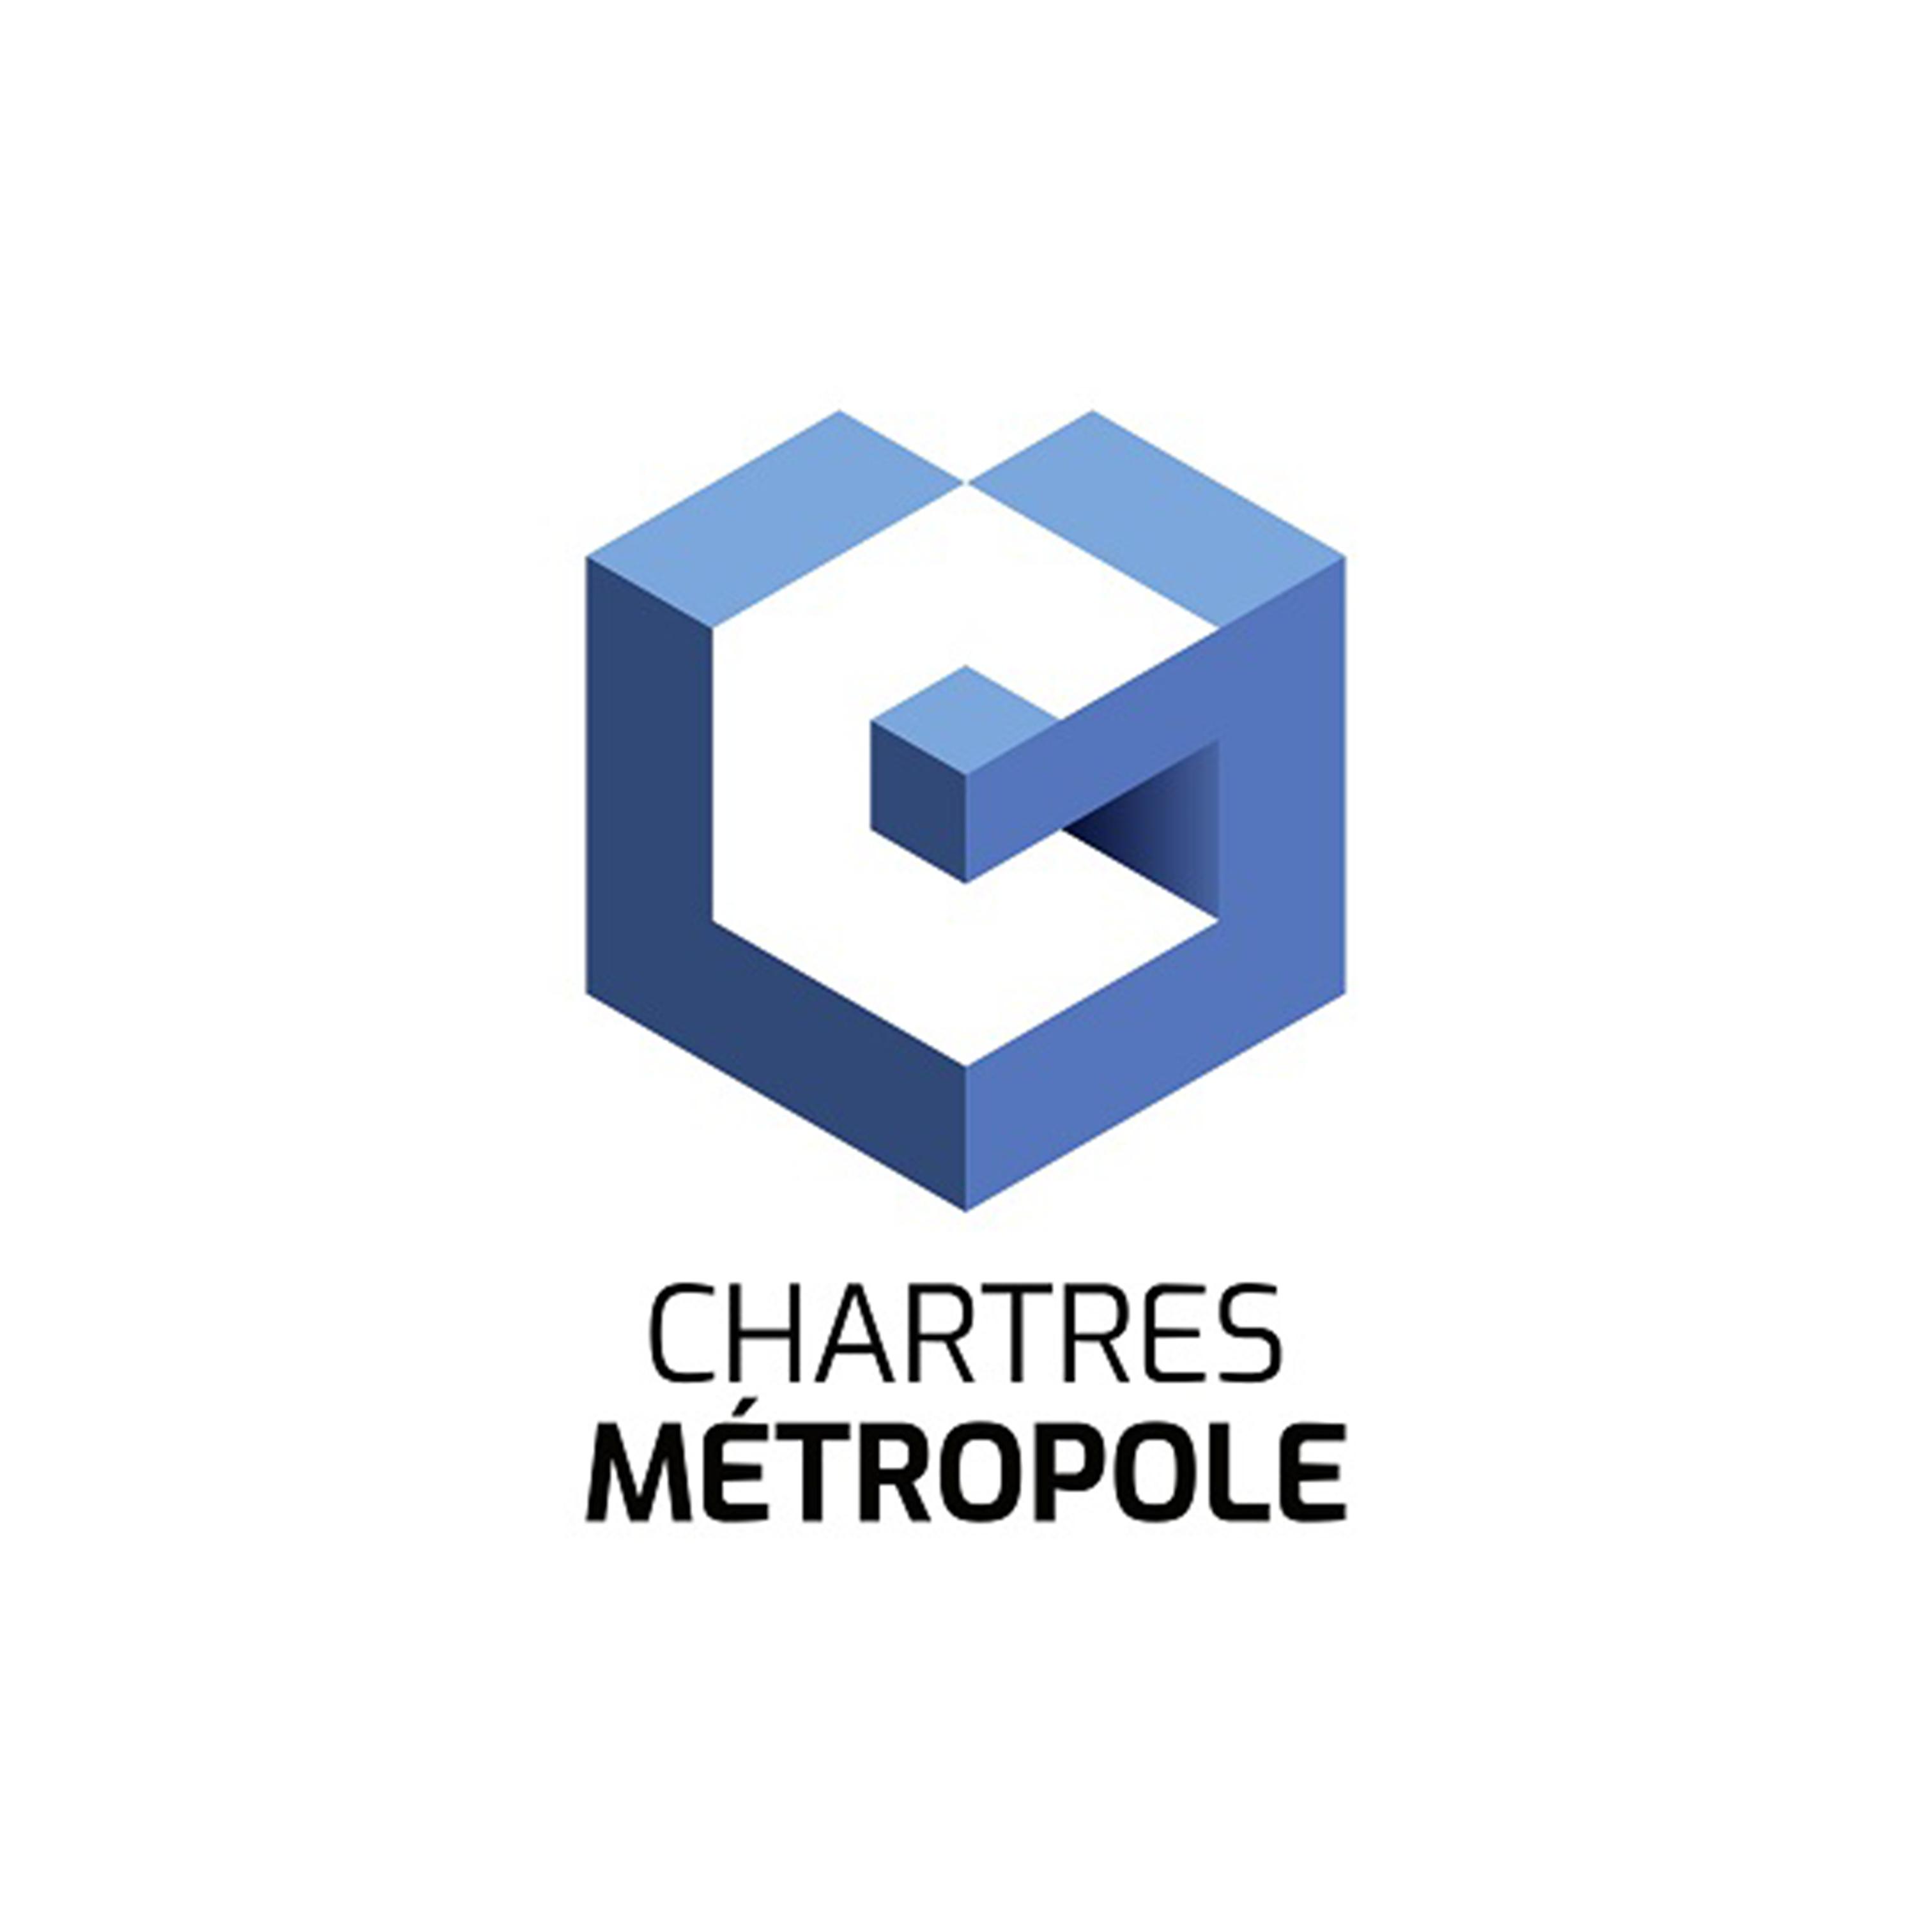 chartres-metropole